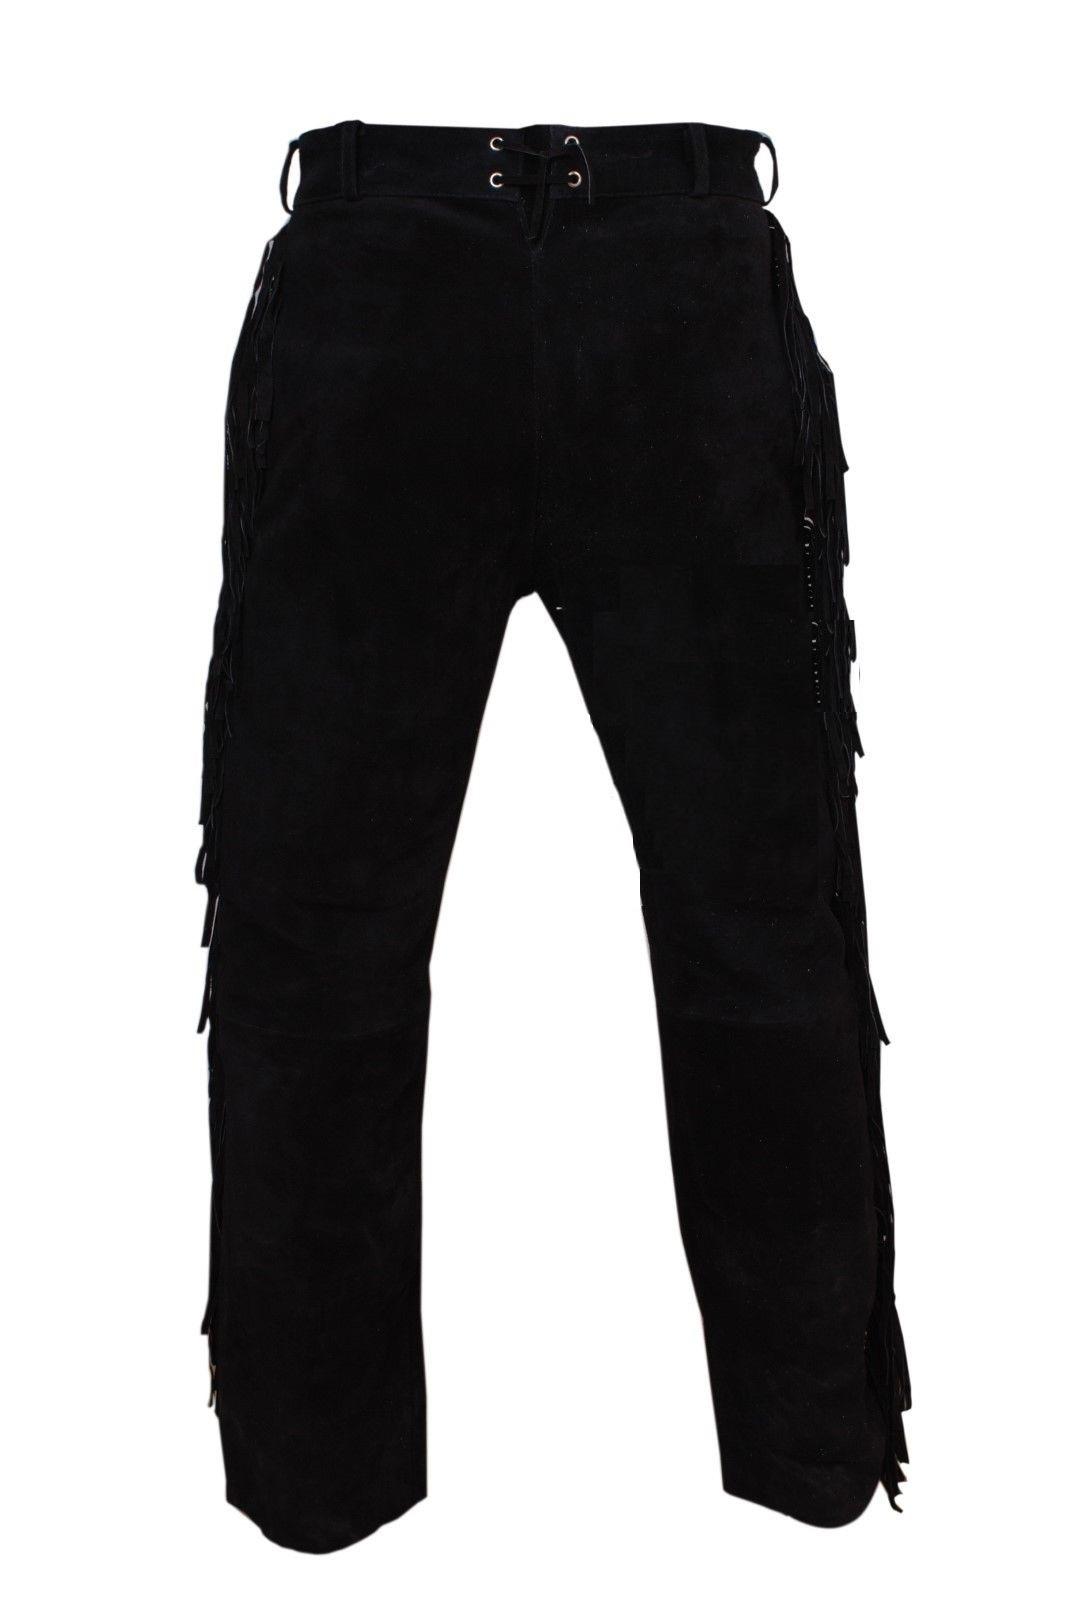 Men New Native American Buckskin Black Goat Suede Leather Bead Shirt & Pant WS69 image 8